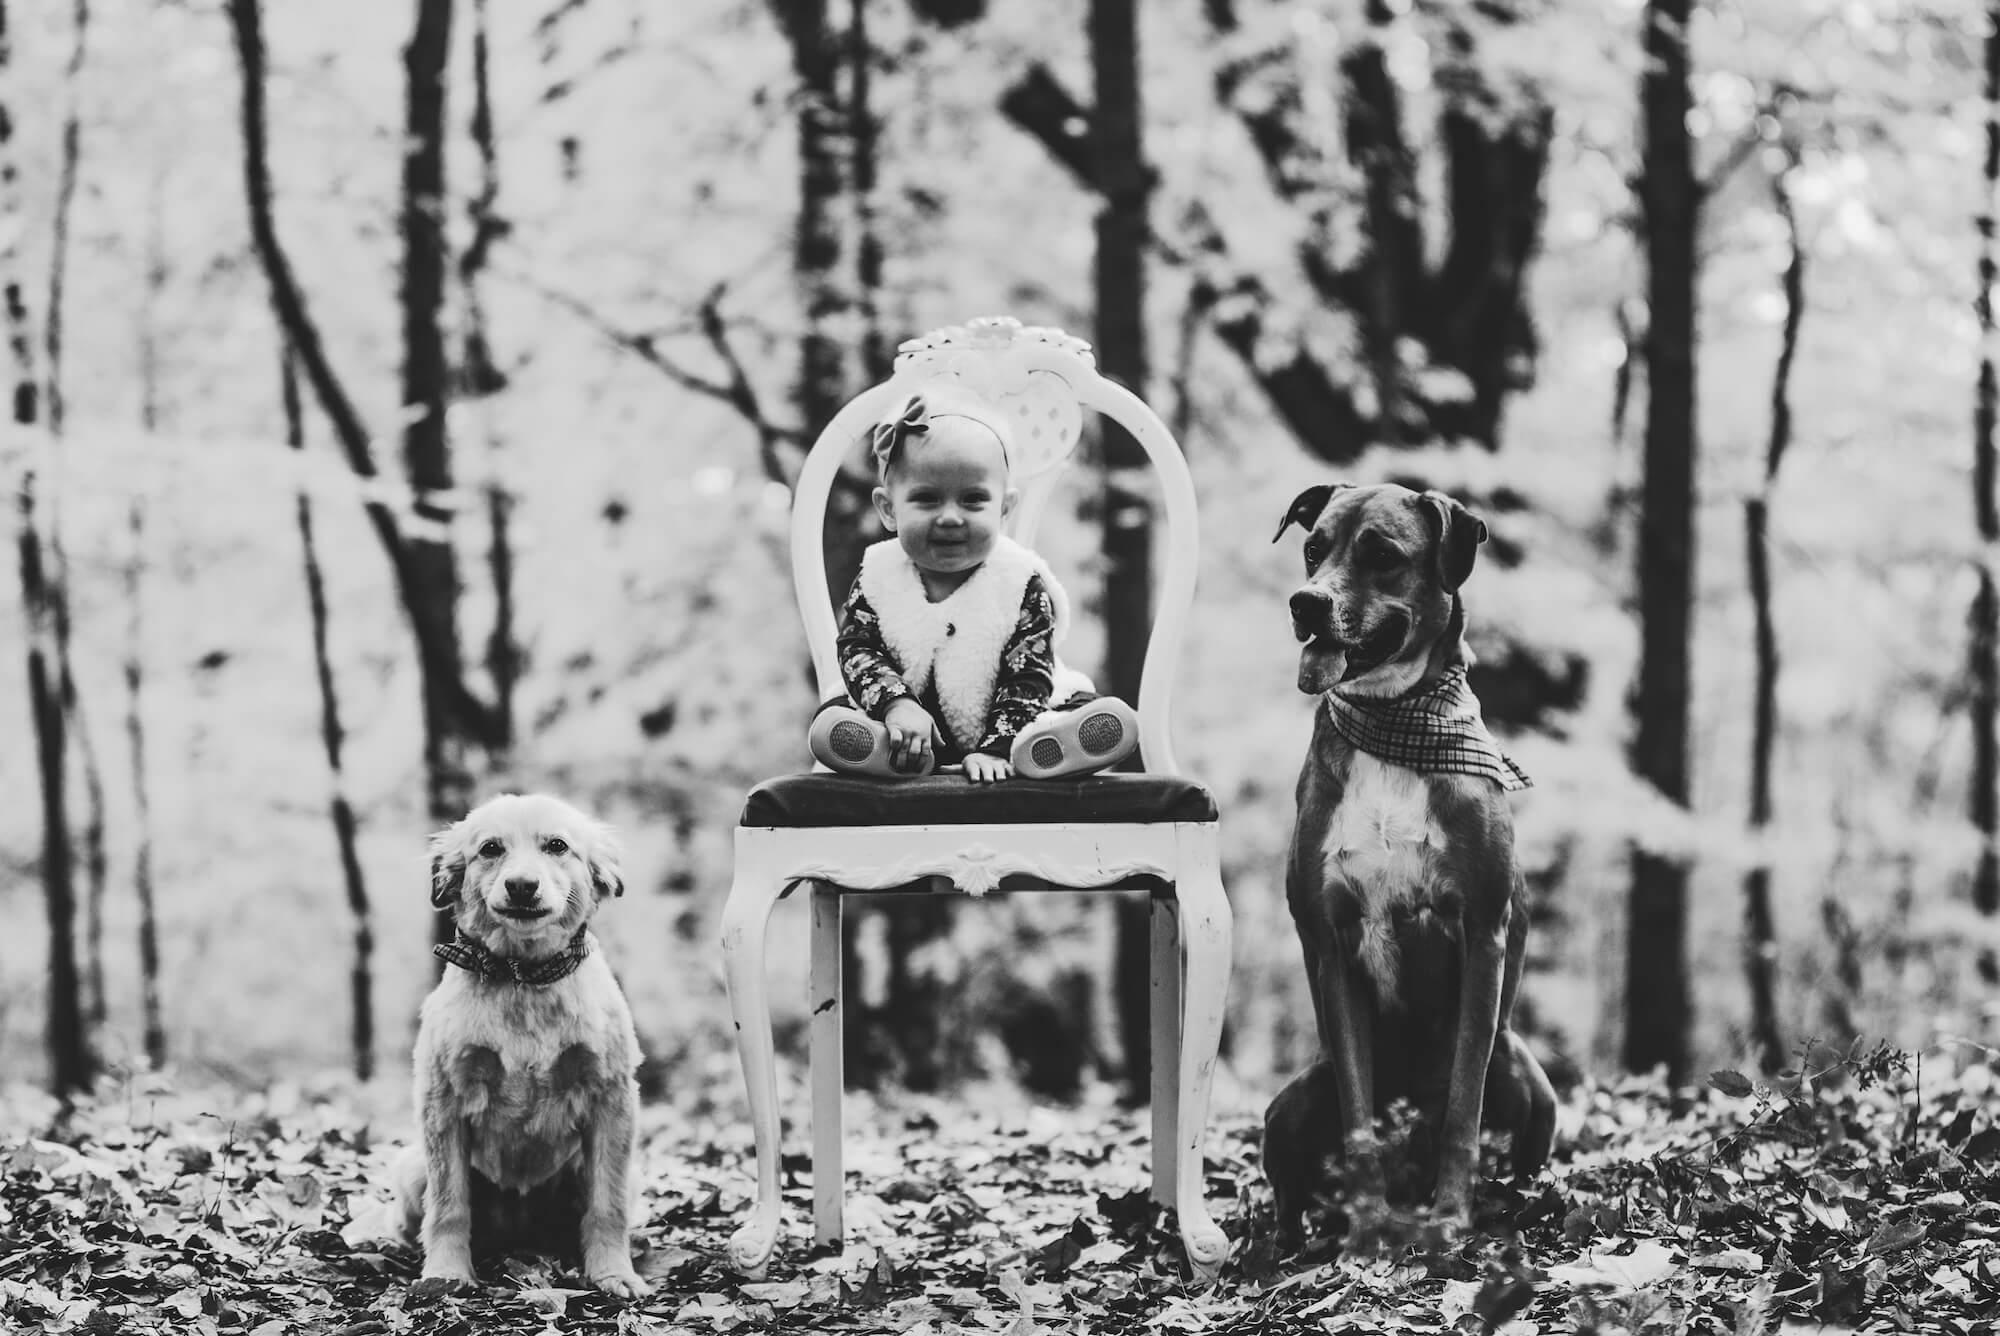 engle-olson-family-photography-session-4.jpg